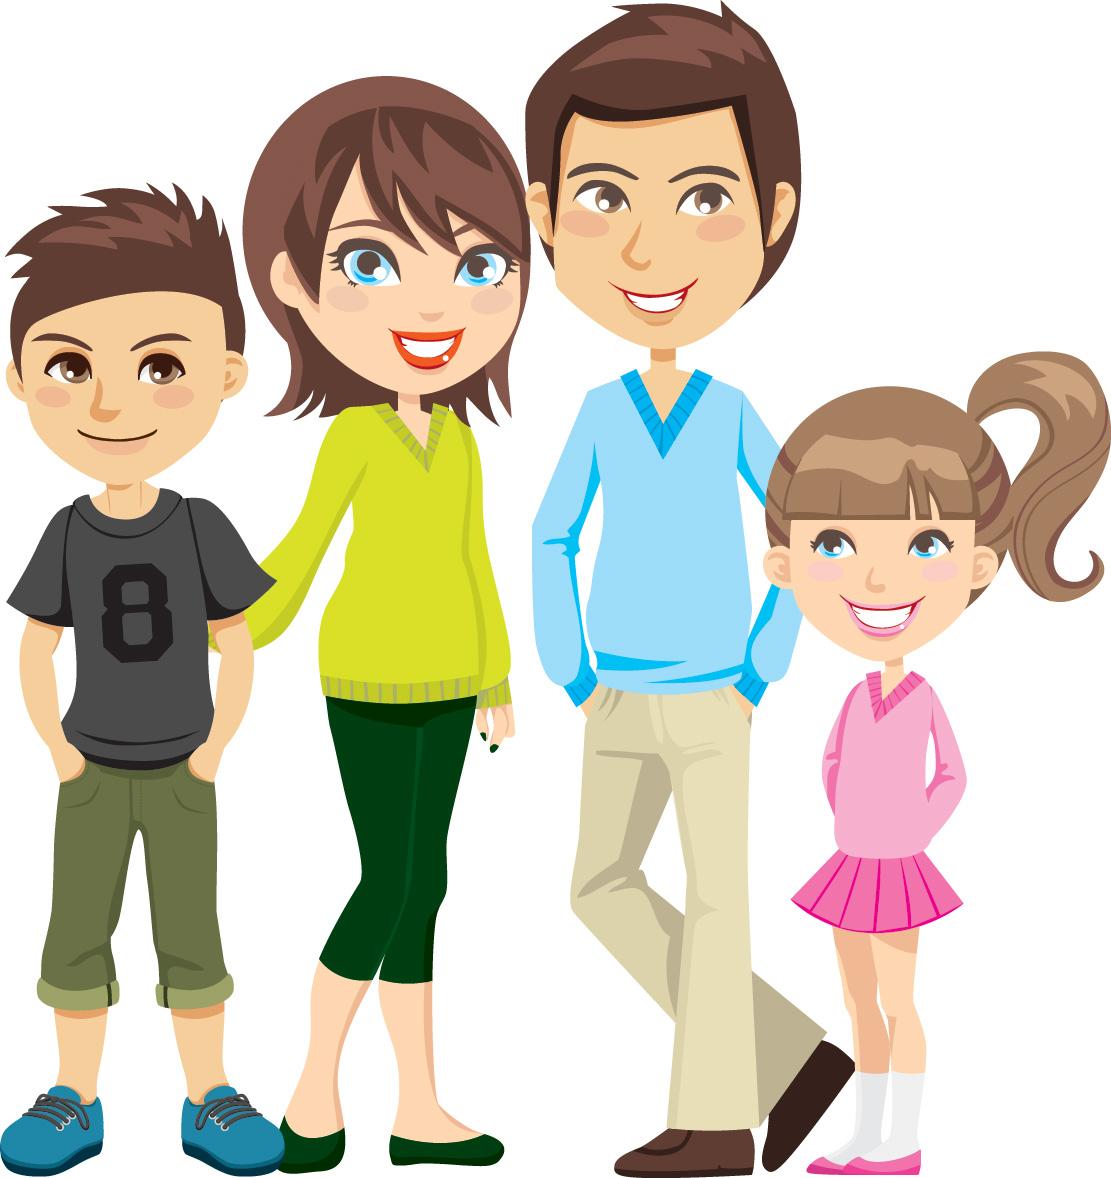 Free Cartoon Family Cliparts, Download Free Cartoon Family ... (1111 x 1178 Pixel)